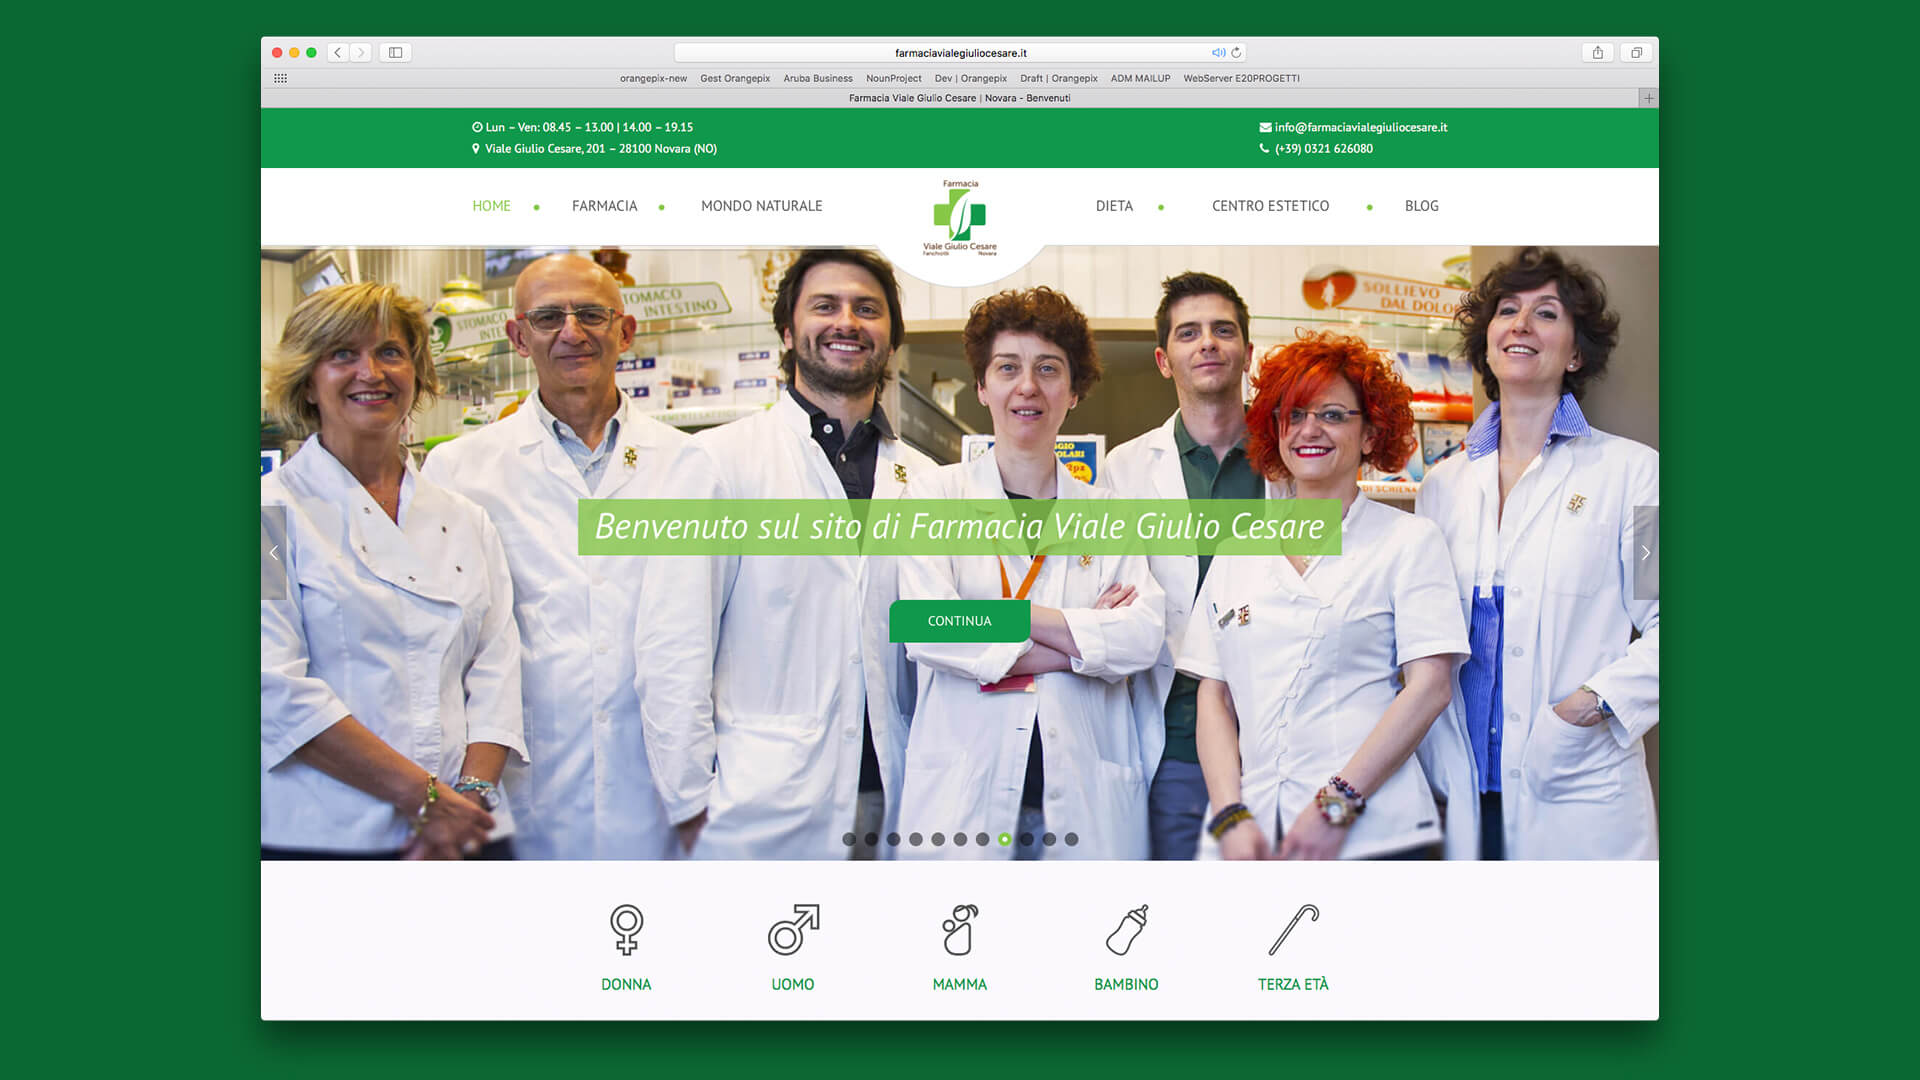 Home page Farmacia Viale Giulio Cesare